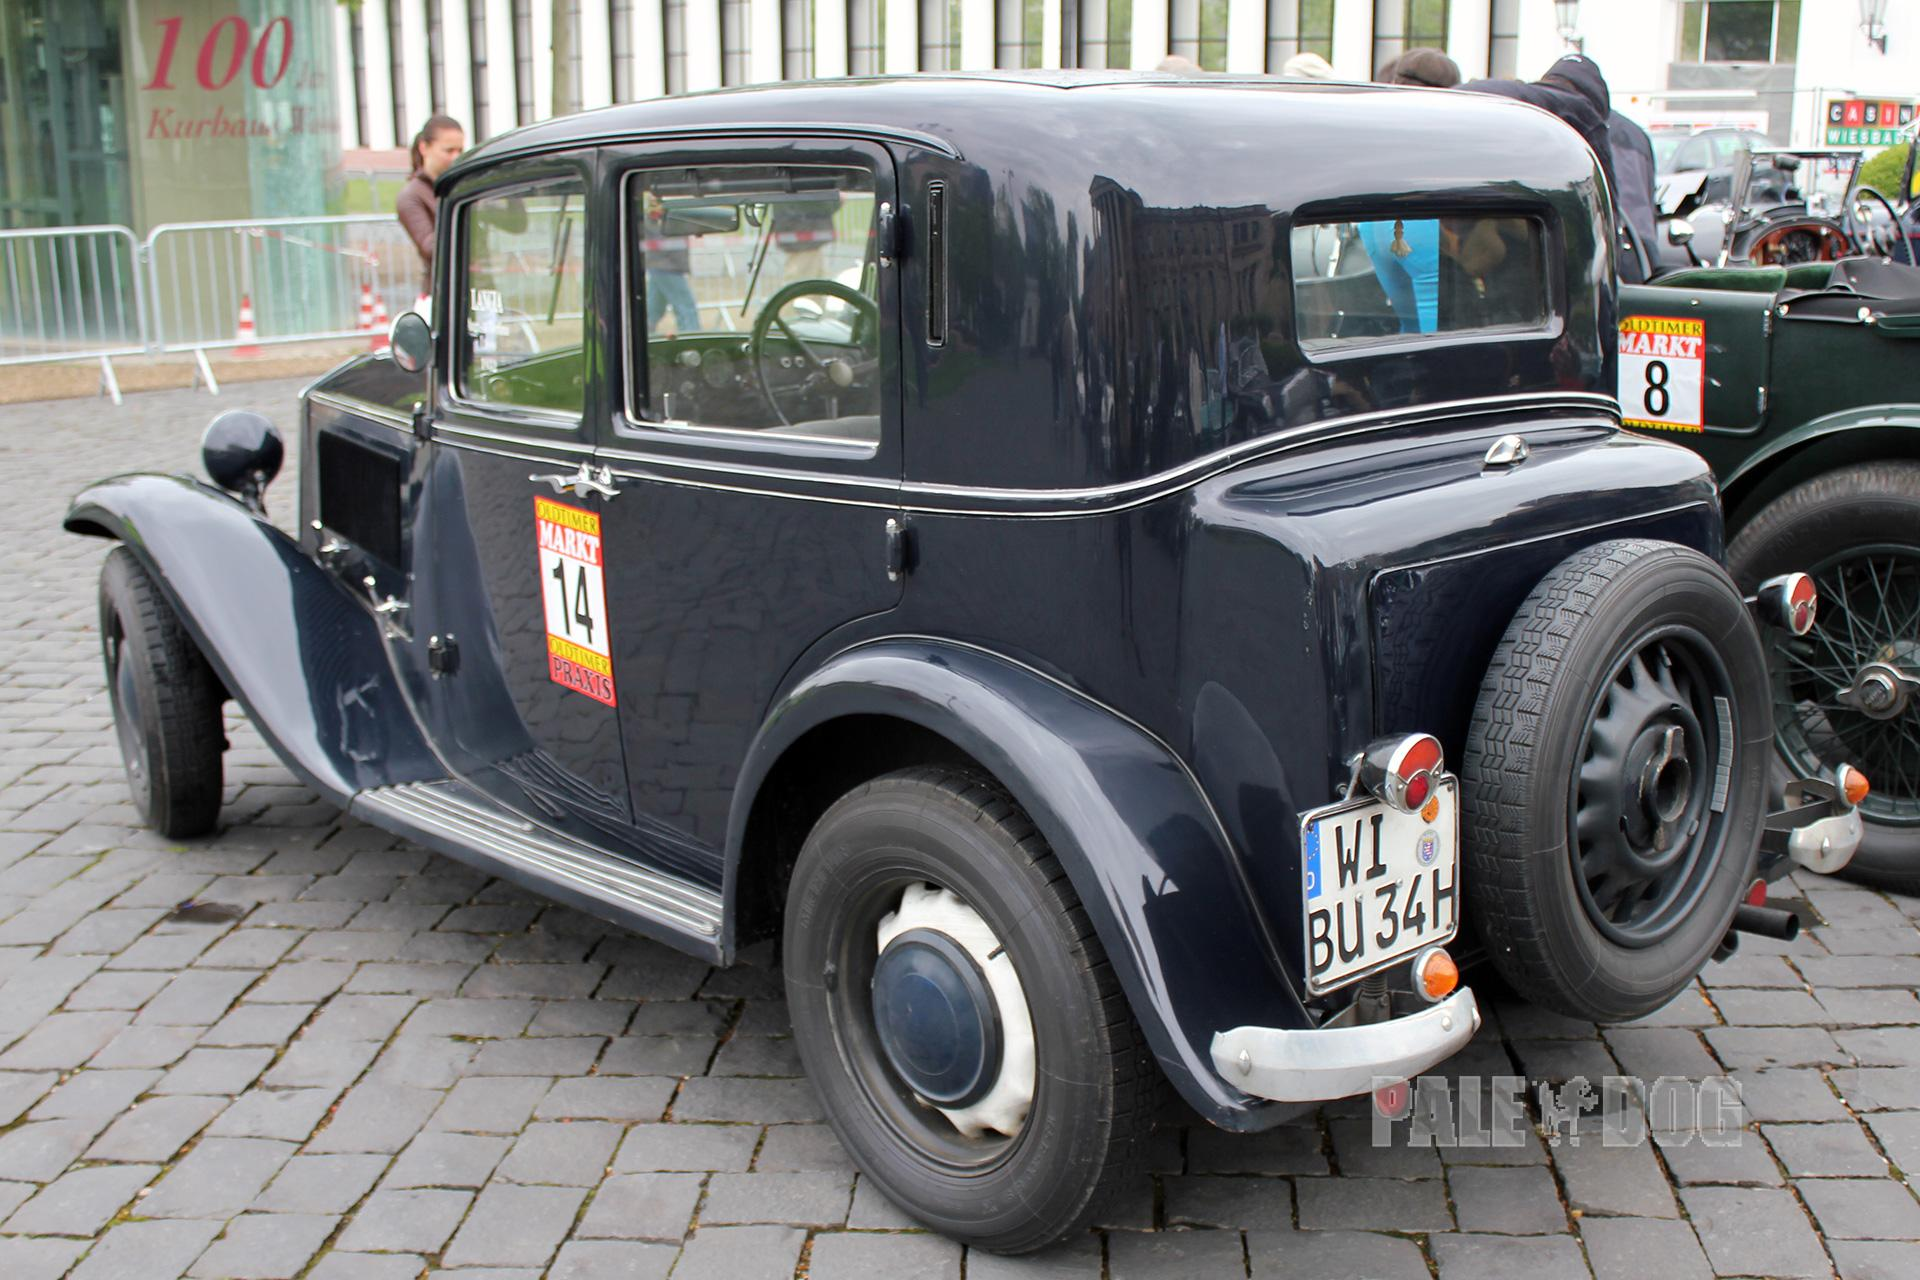 https://www.paledog.de/cache/Automobile/post-vintage/54f48c04c1388c7a79d1e4f29501c98766e8597f.1932-lancia-augusta-berlina_rear_FULL_paledog.jpg